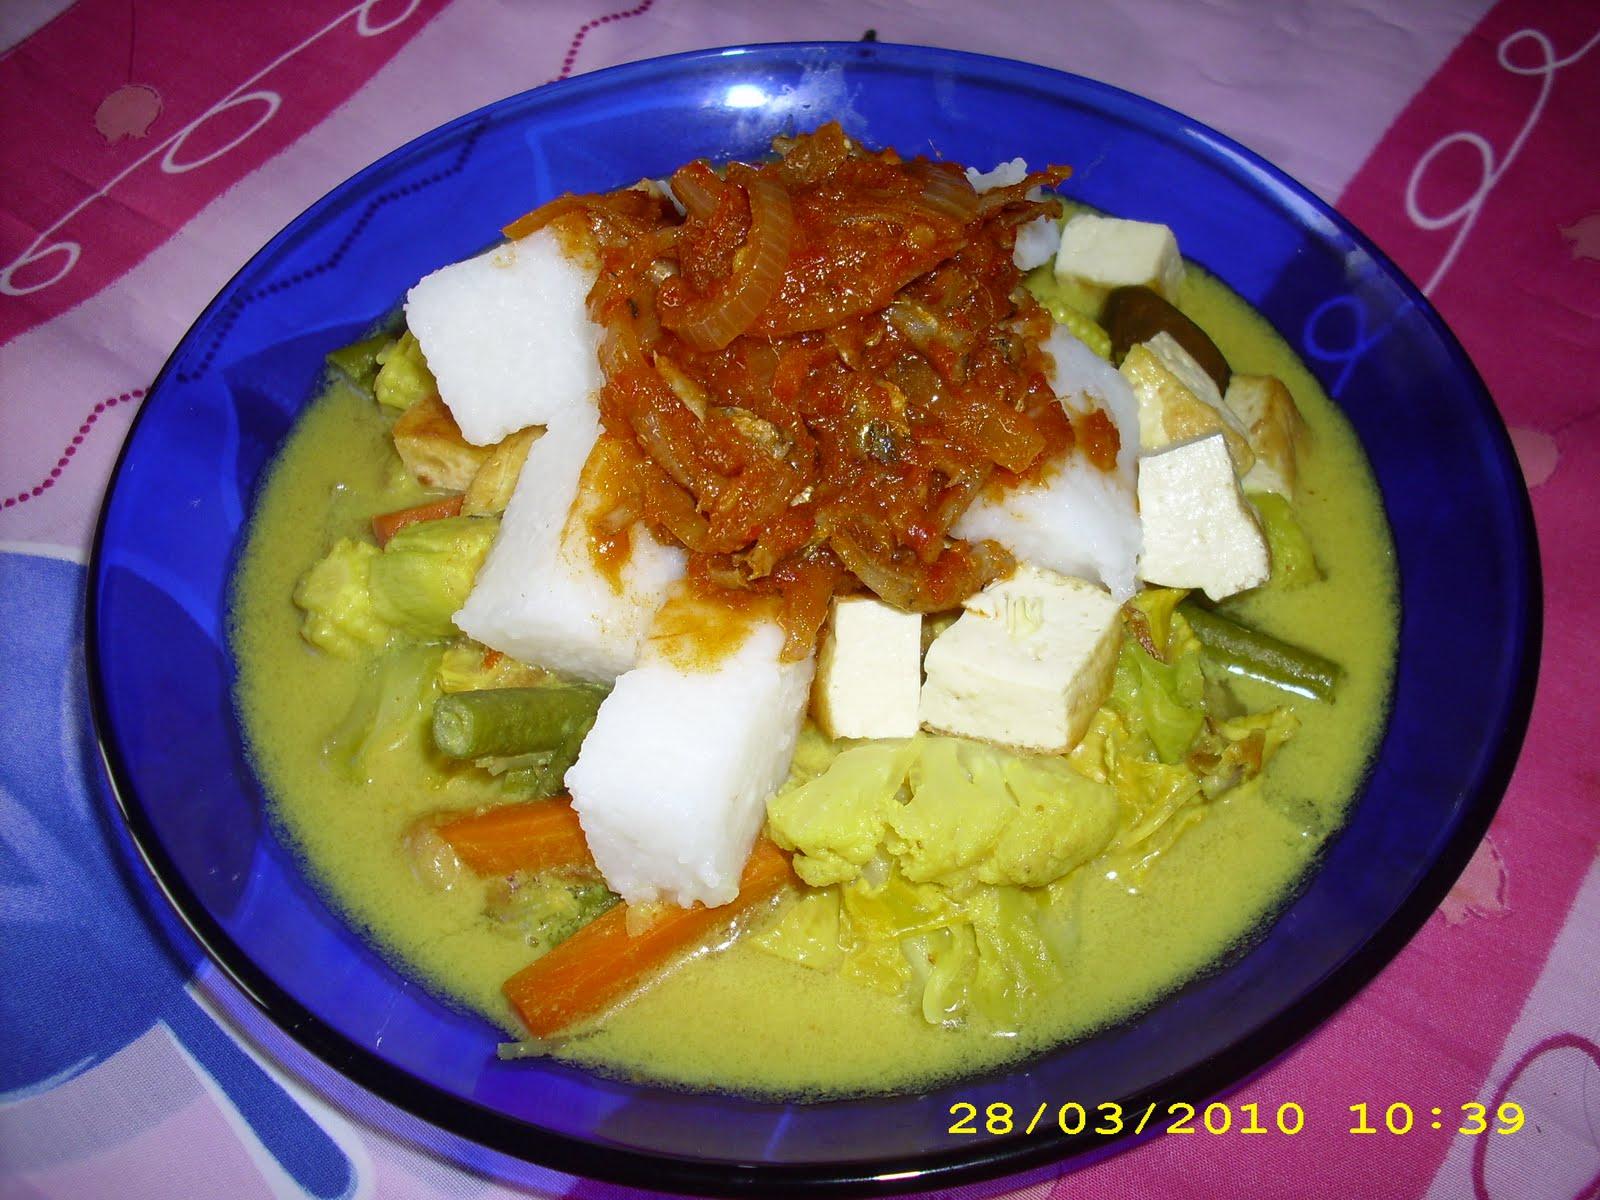 Nasi lemak azrai best catering lontong johor d for Best catering